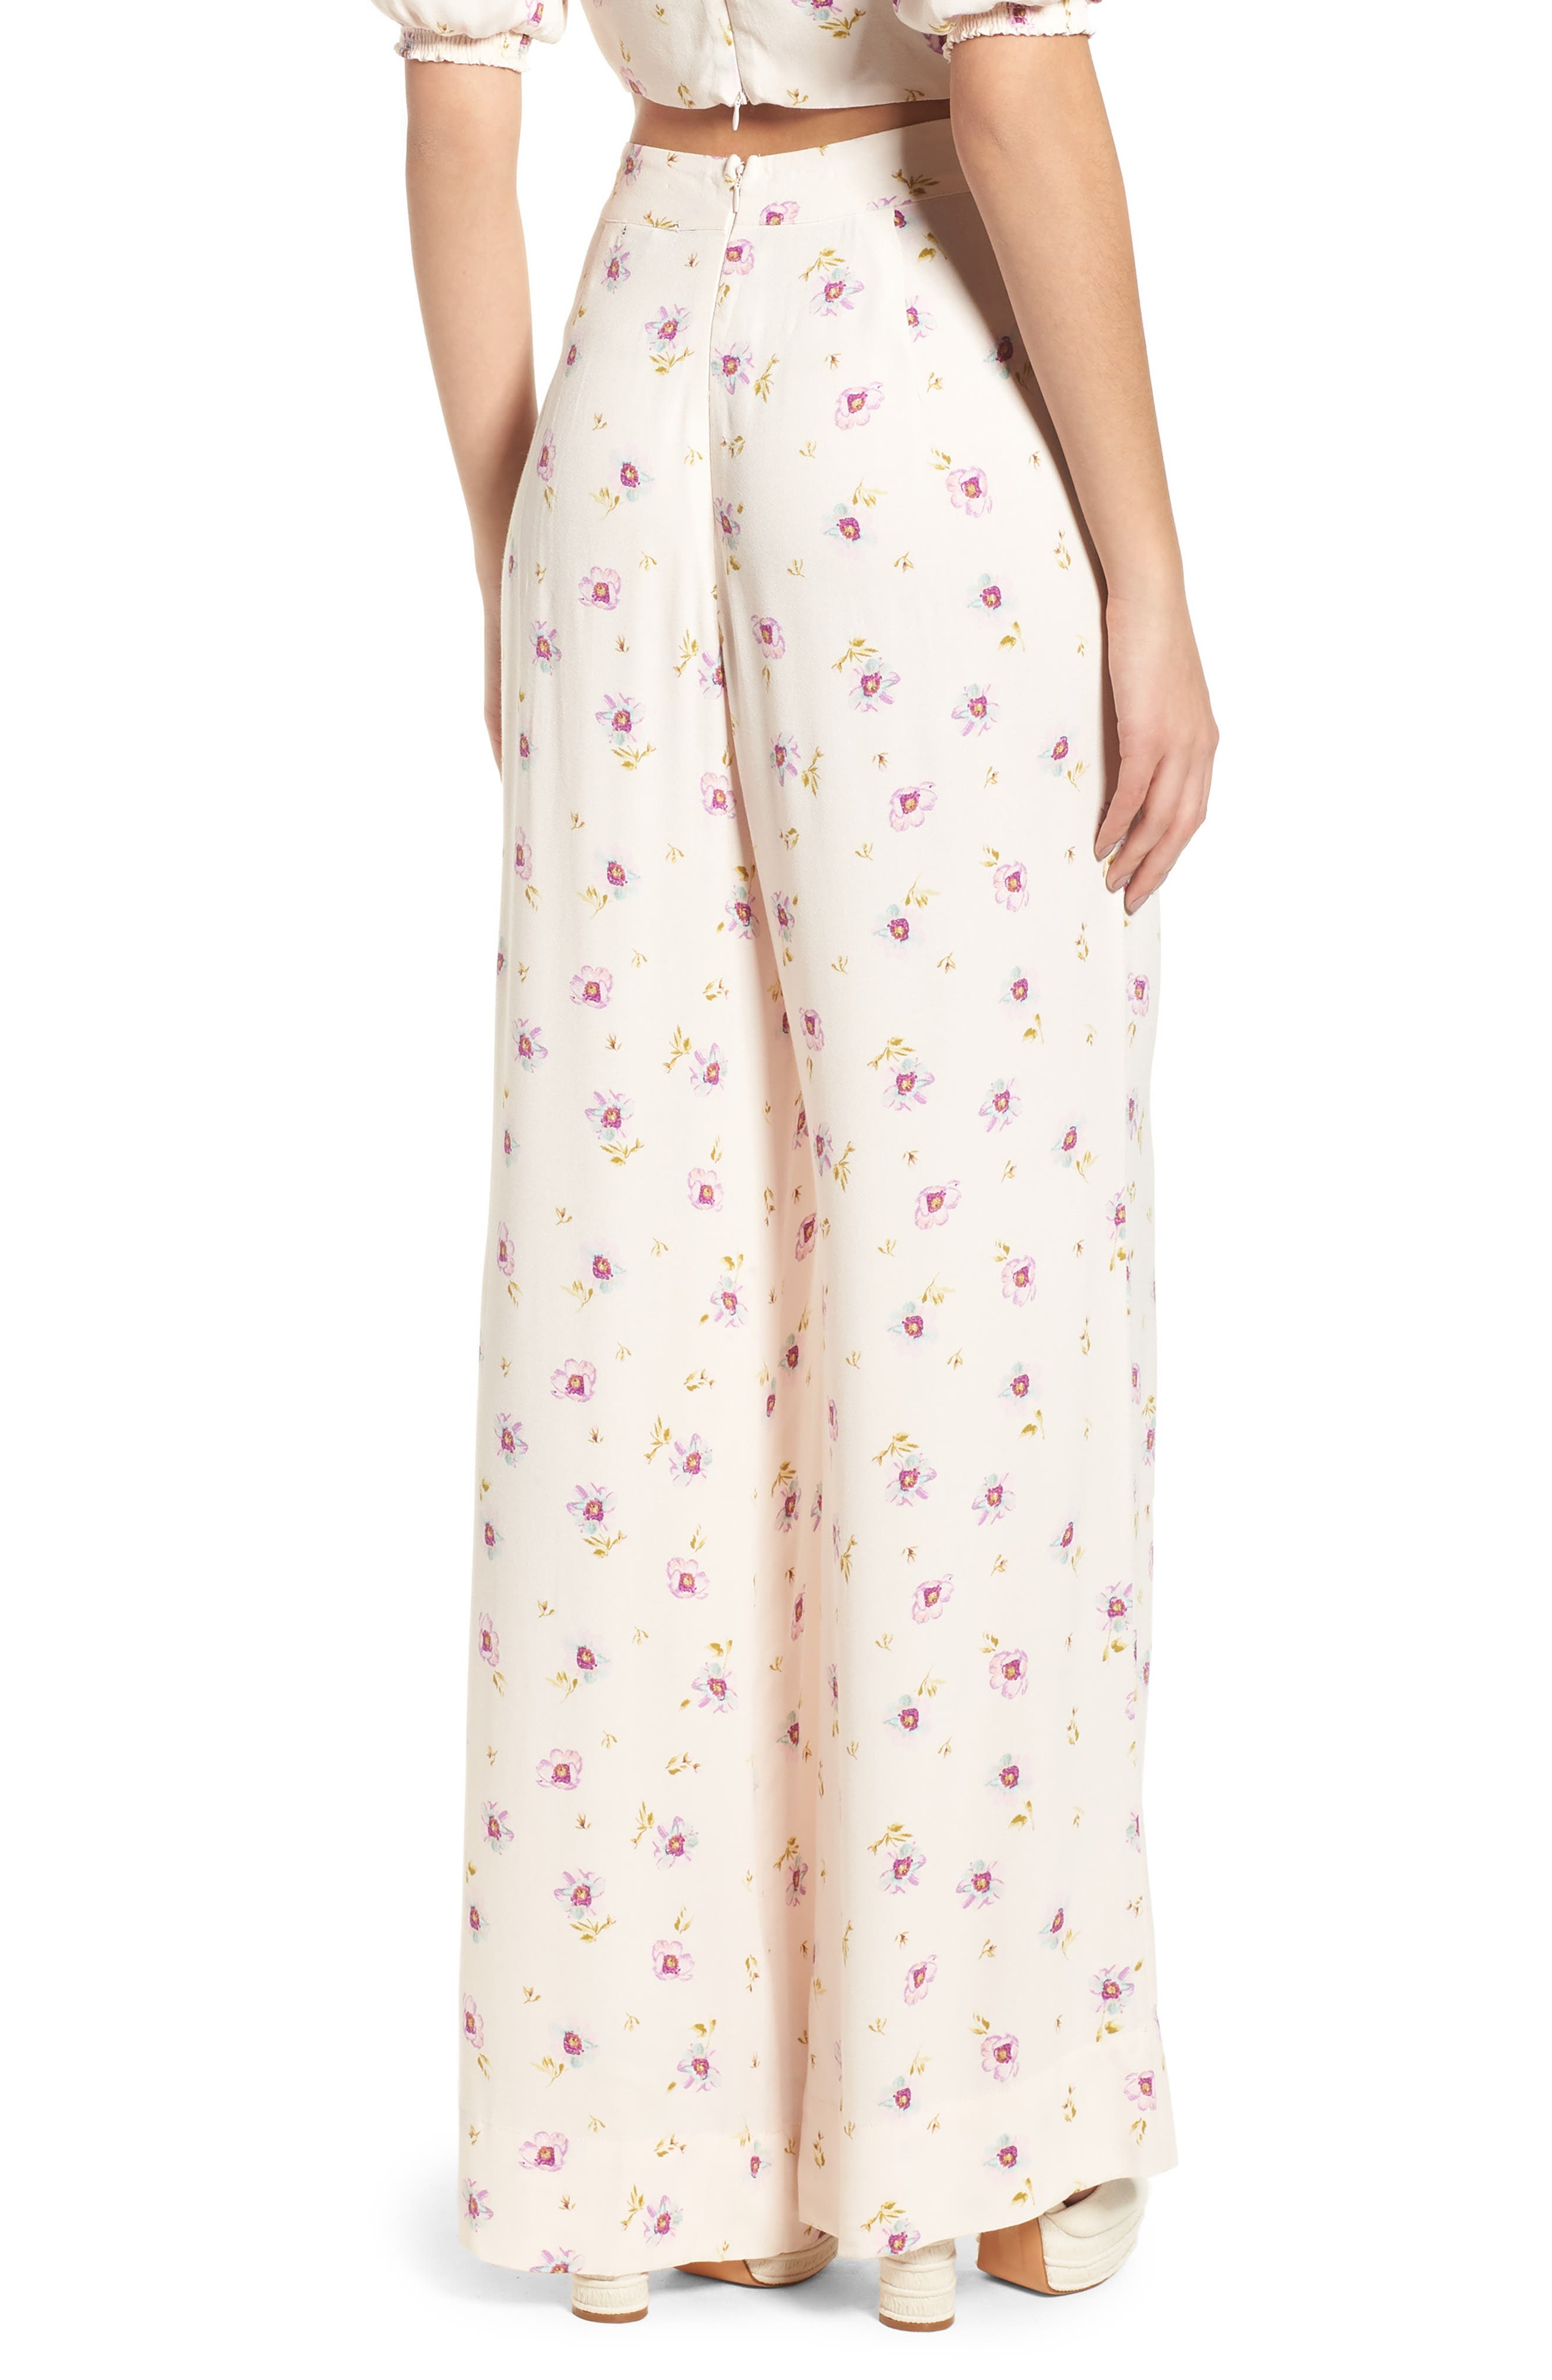 Carter High Waist Wide Leg Pants,                             Alternate thumbnail 3, color,                             Lilac Floral